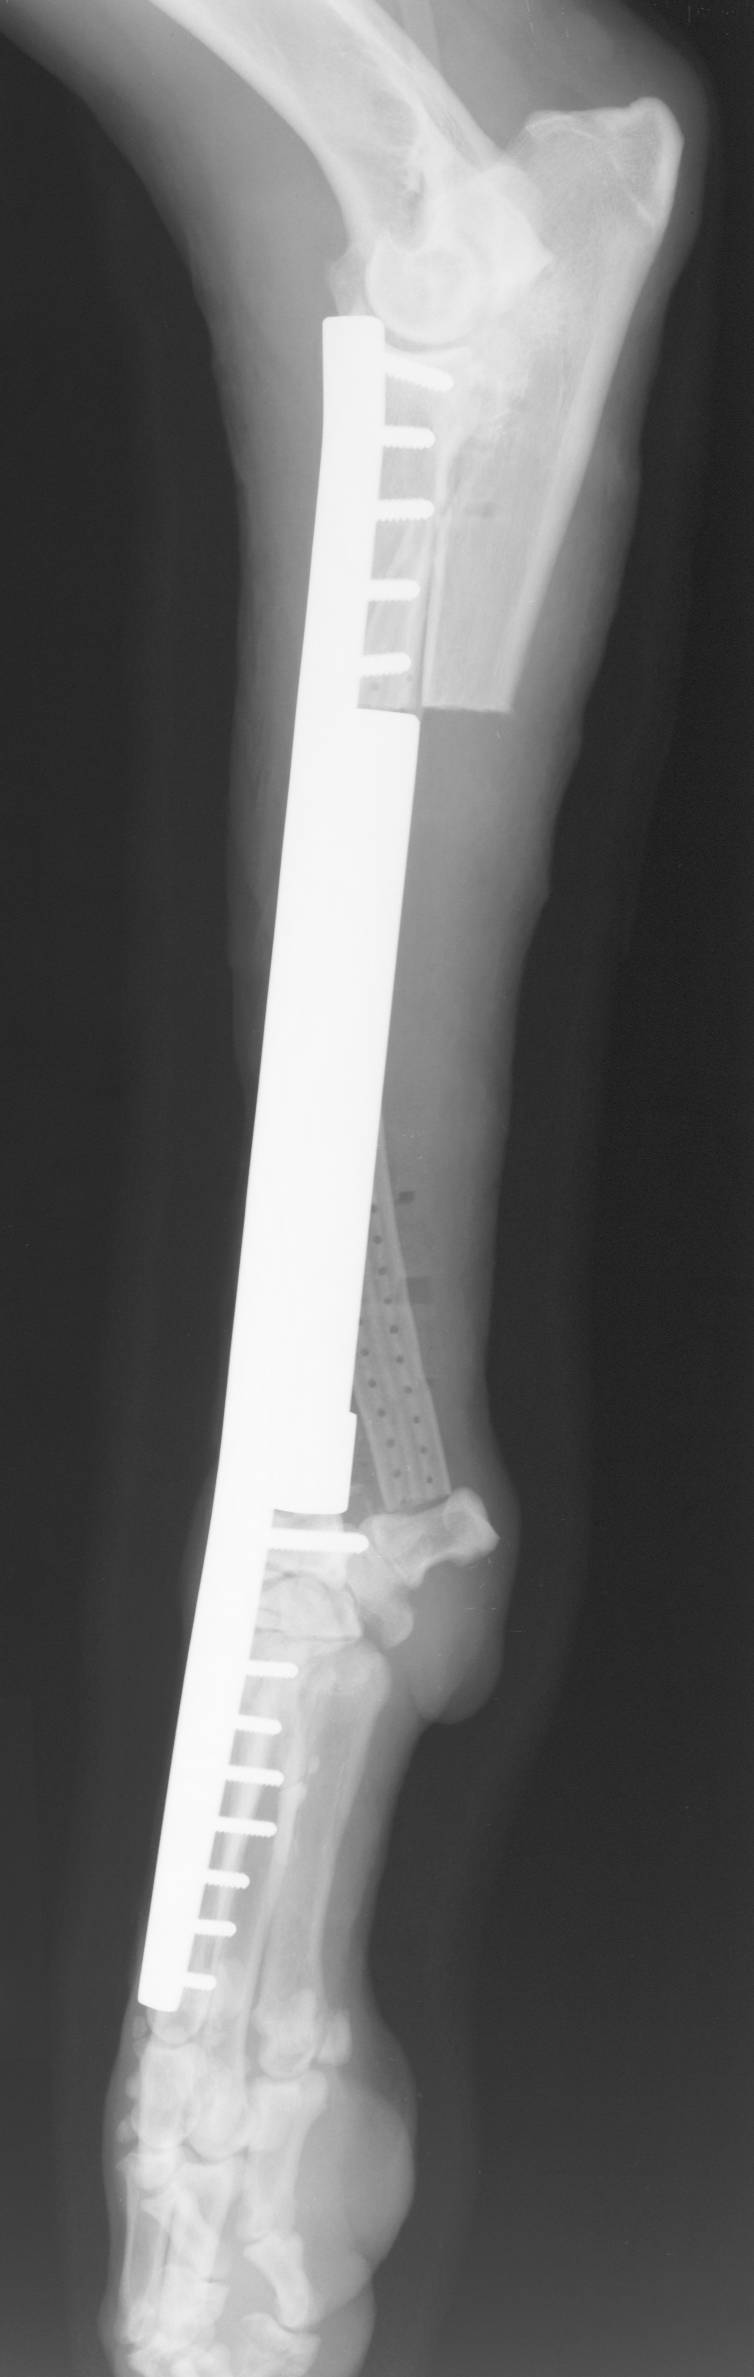 Endoprosthesis Limb-Sparing Surgery